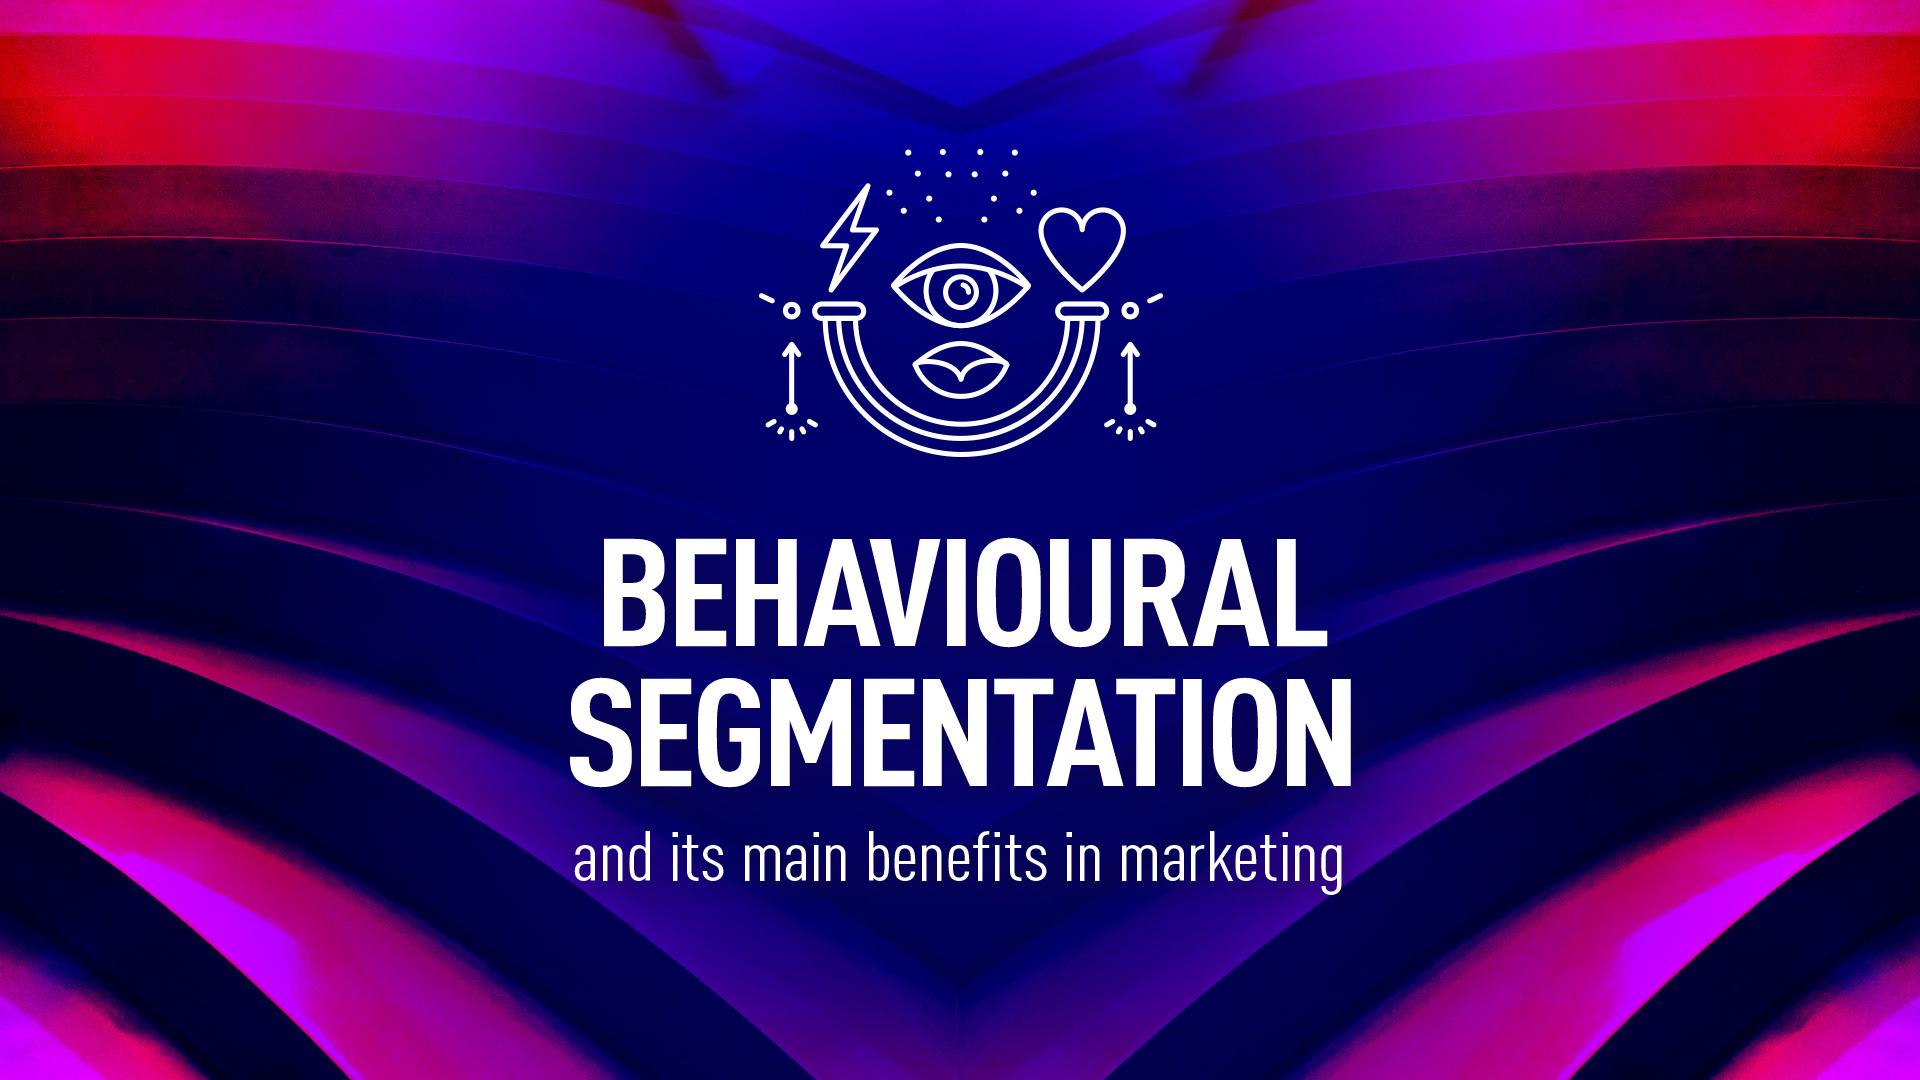 Behavioural segmentation in marketing benefits